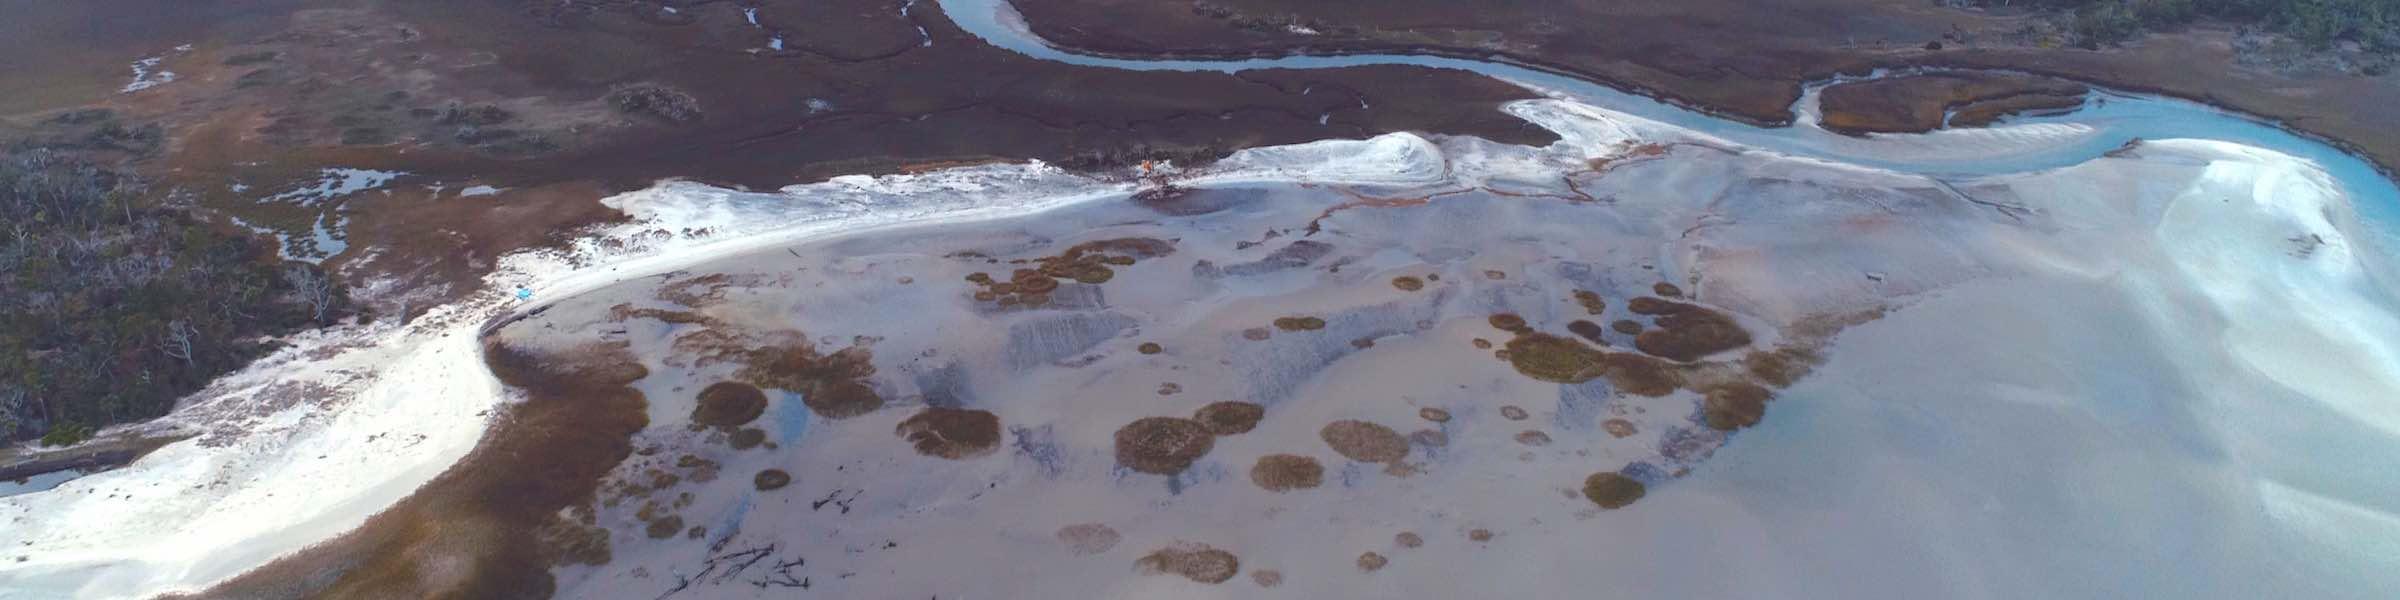 Aerial view of Little Tybee Island, Georgia.